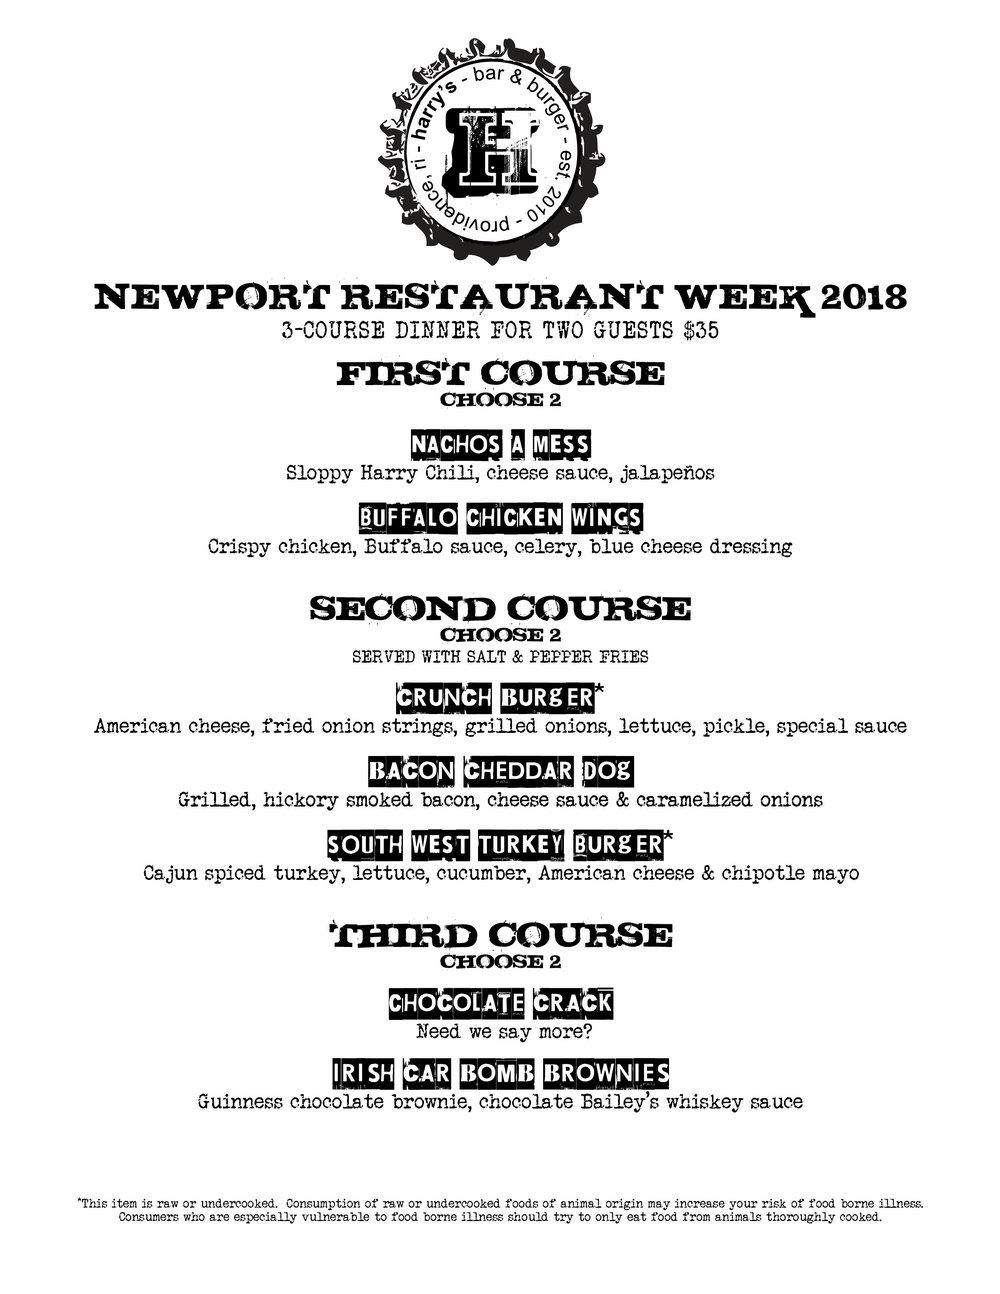 Newport_RW_harrys_dinner fall 2018.jpg